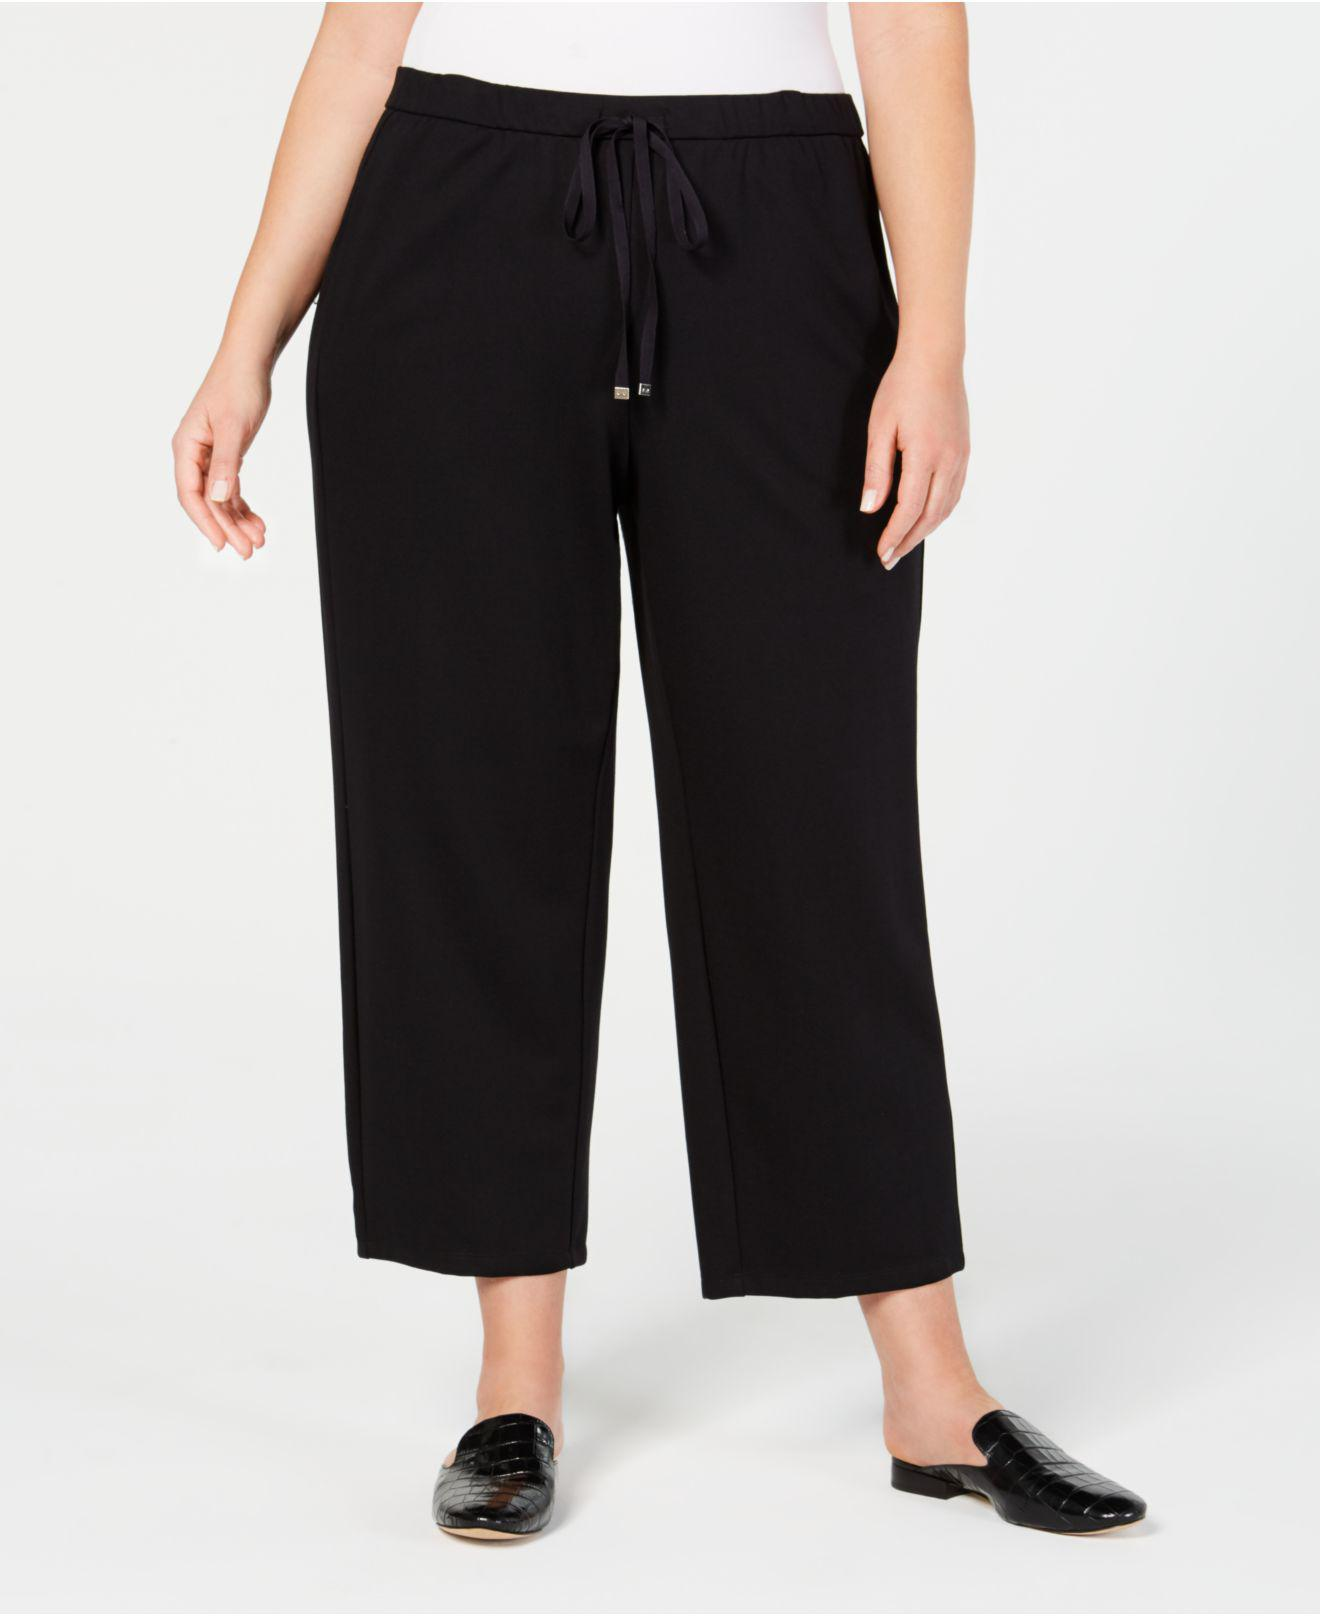 915c9951272 Eileen Fisher. Women s Black Plus Size Ponte Drawstring-waist Ankle Pants